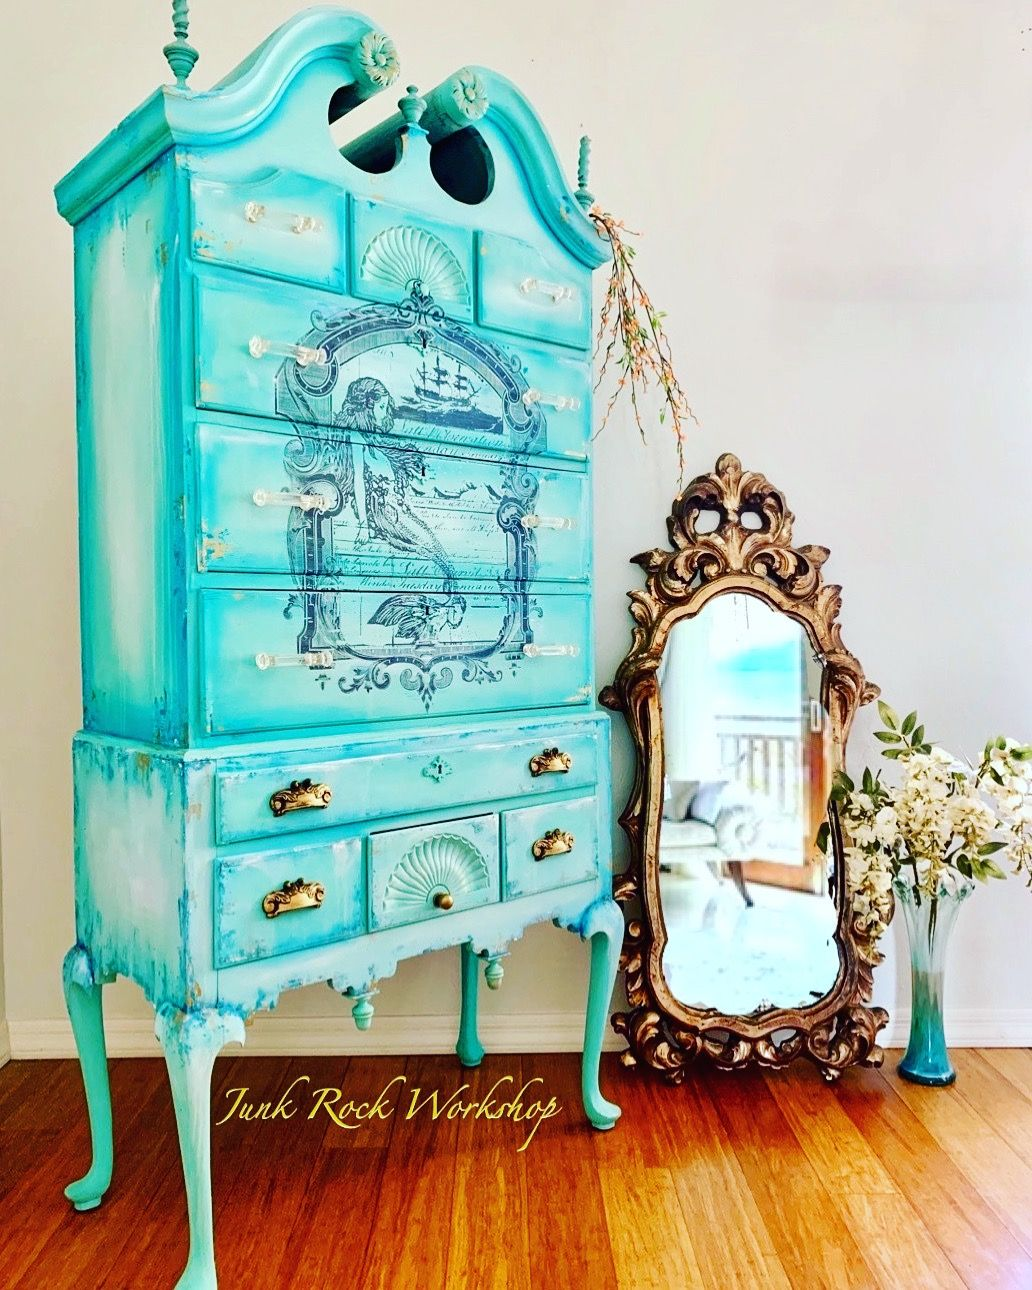 #beachhousedecor #furniture #furnitureartist